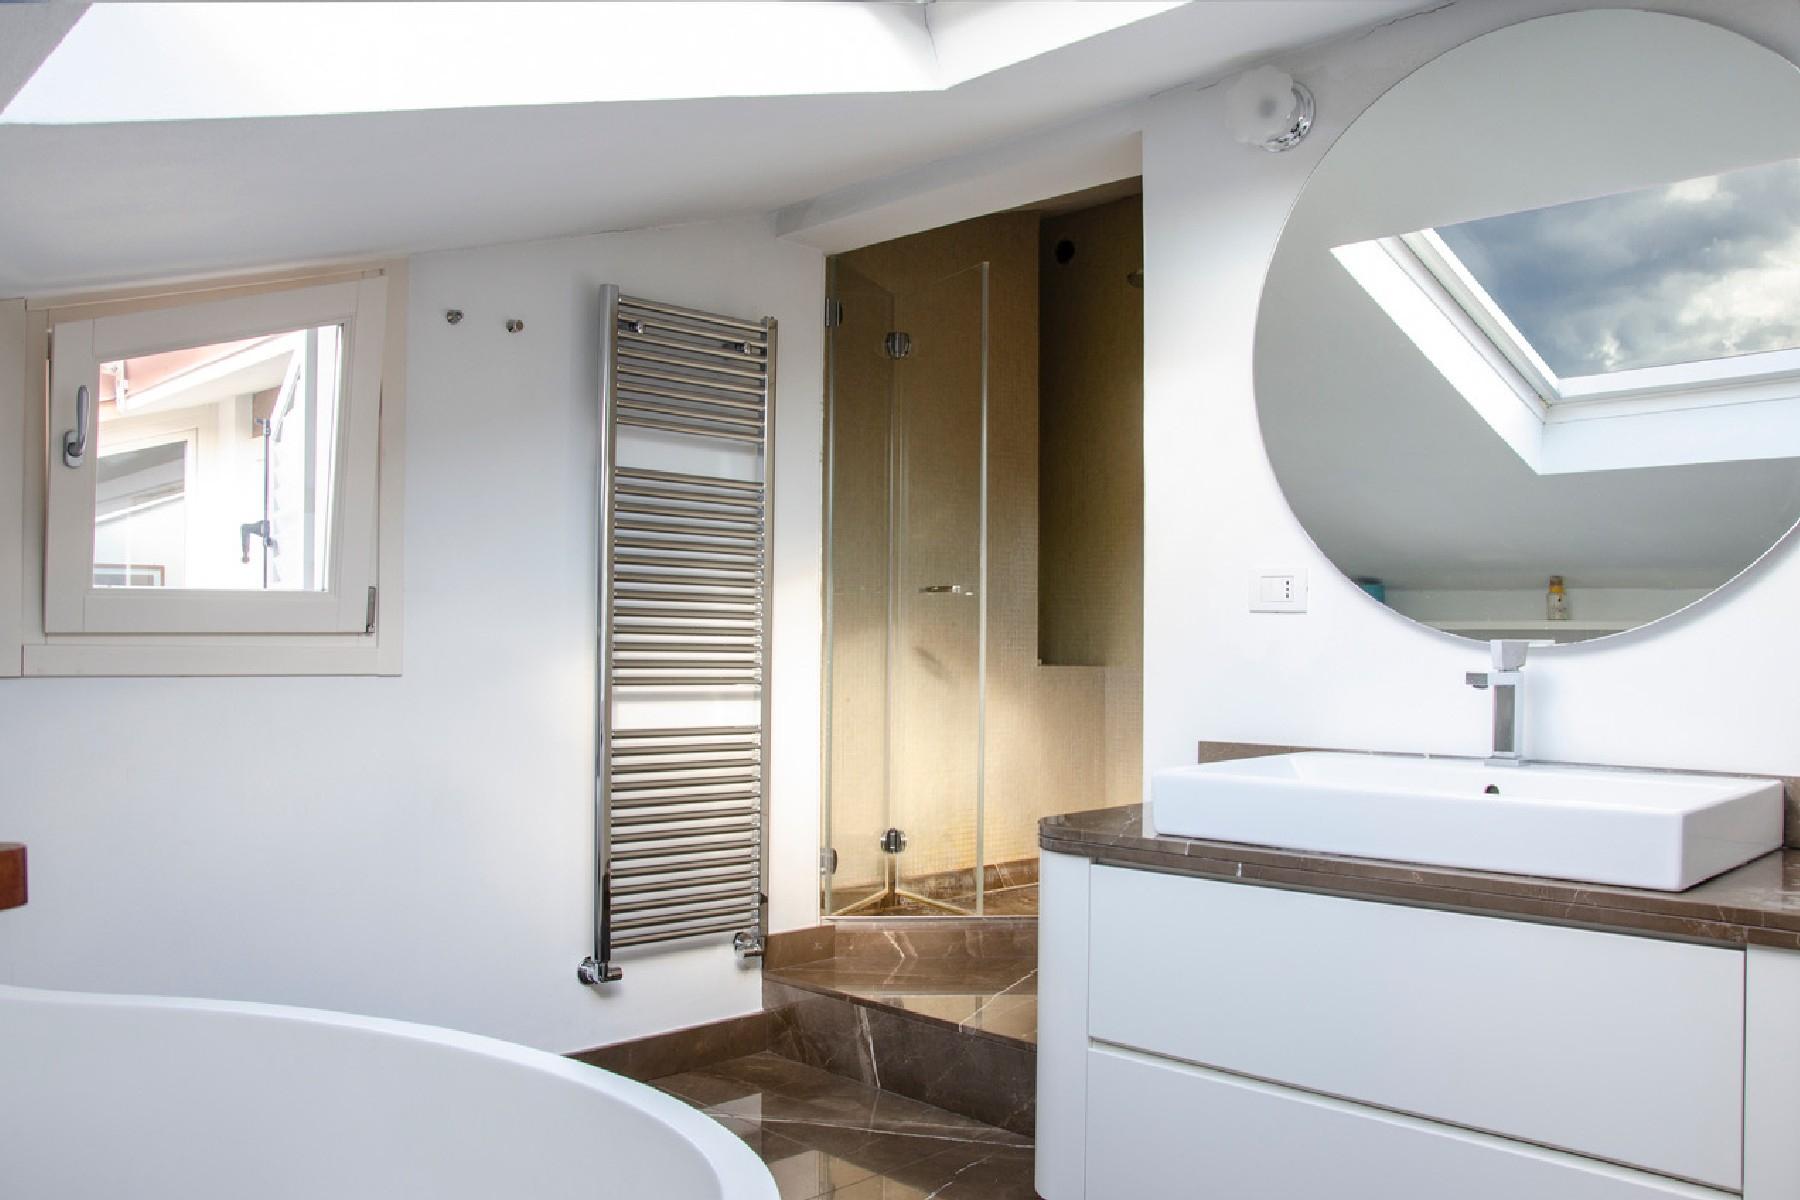 Appartamento in Vendita a Merate: 4 locali, 225 mq - Foto 20